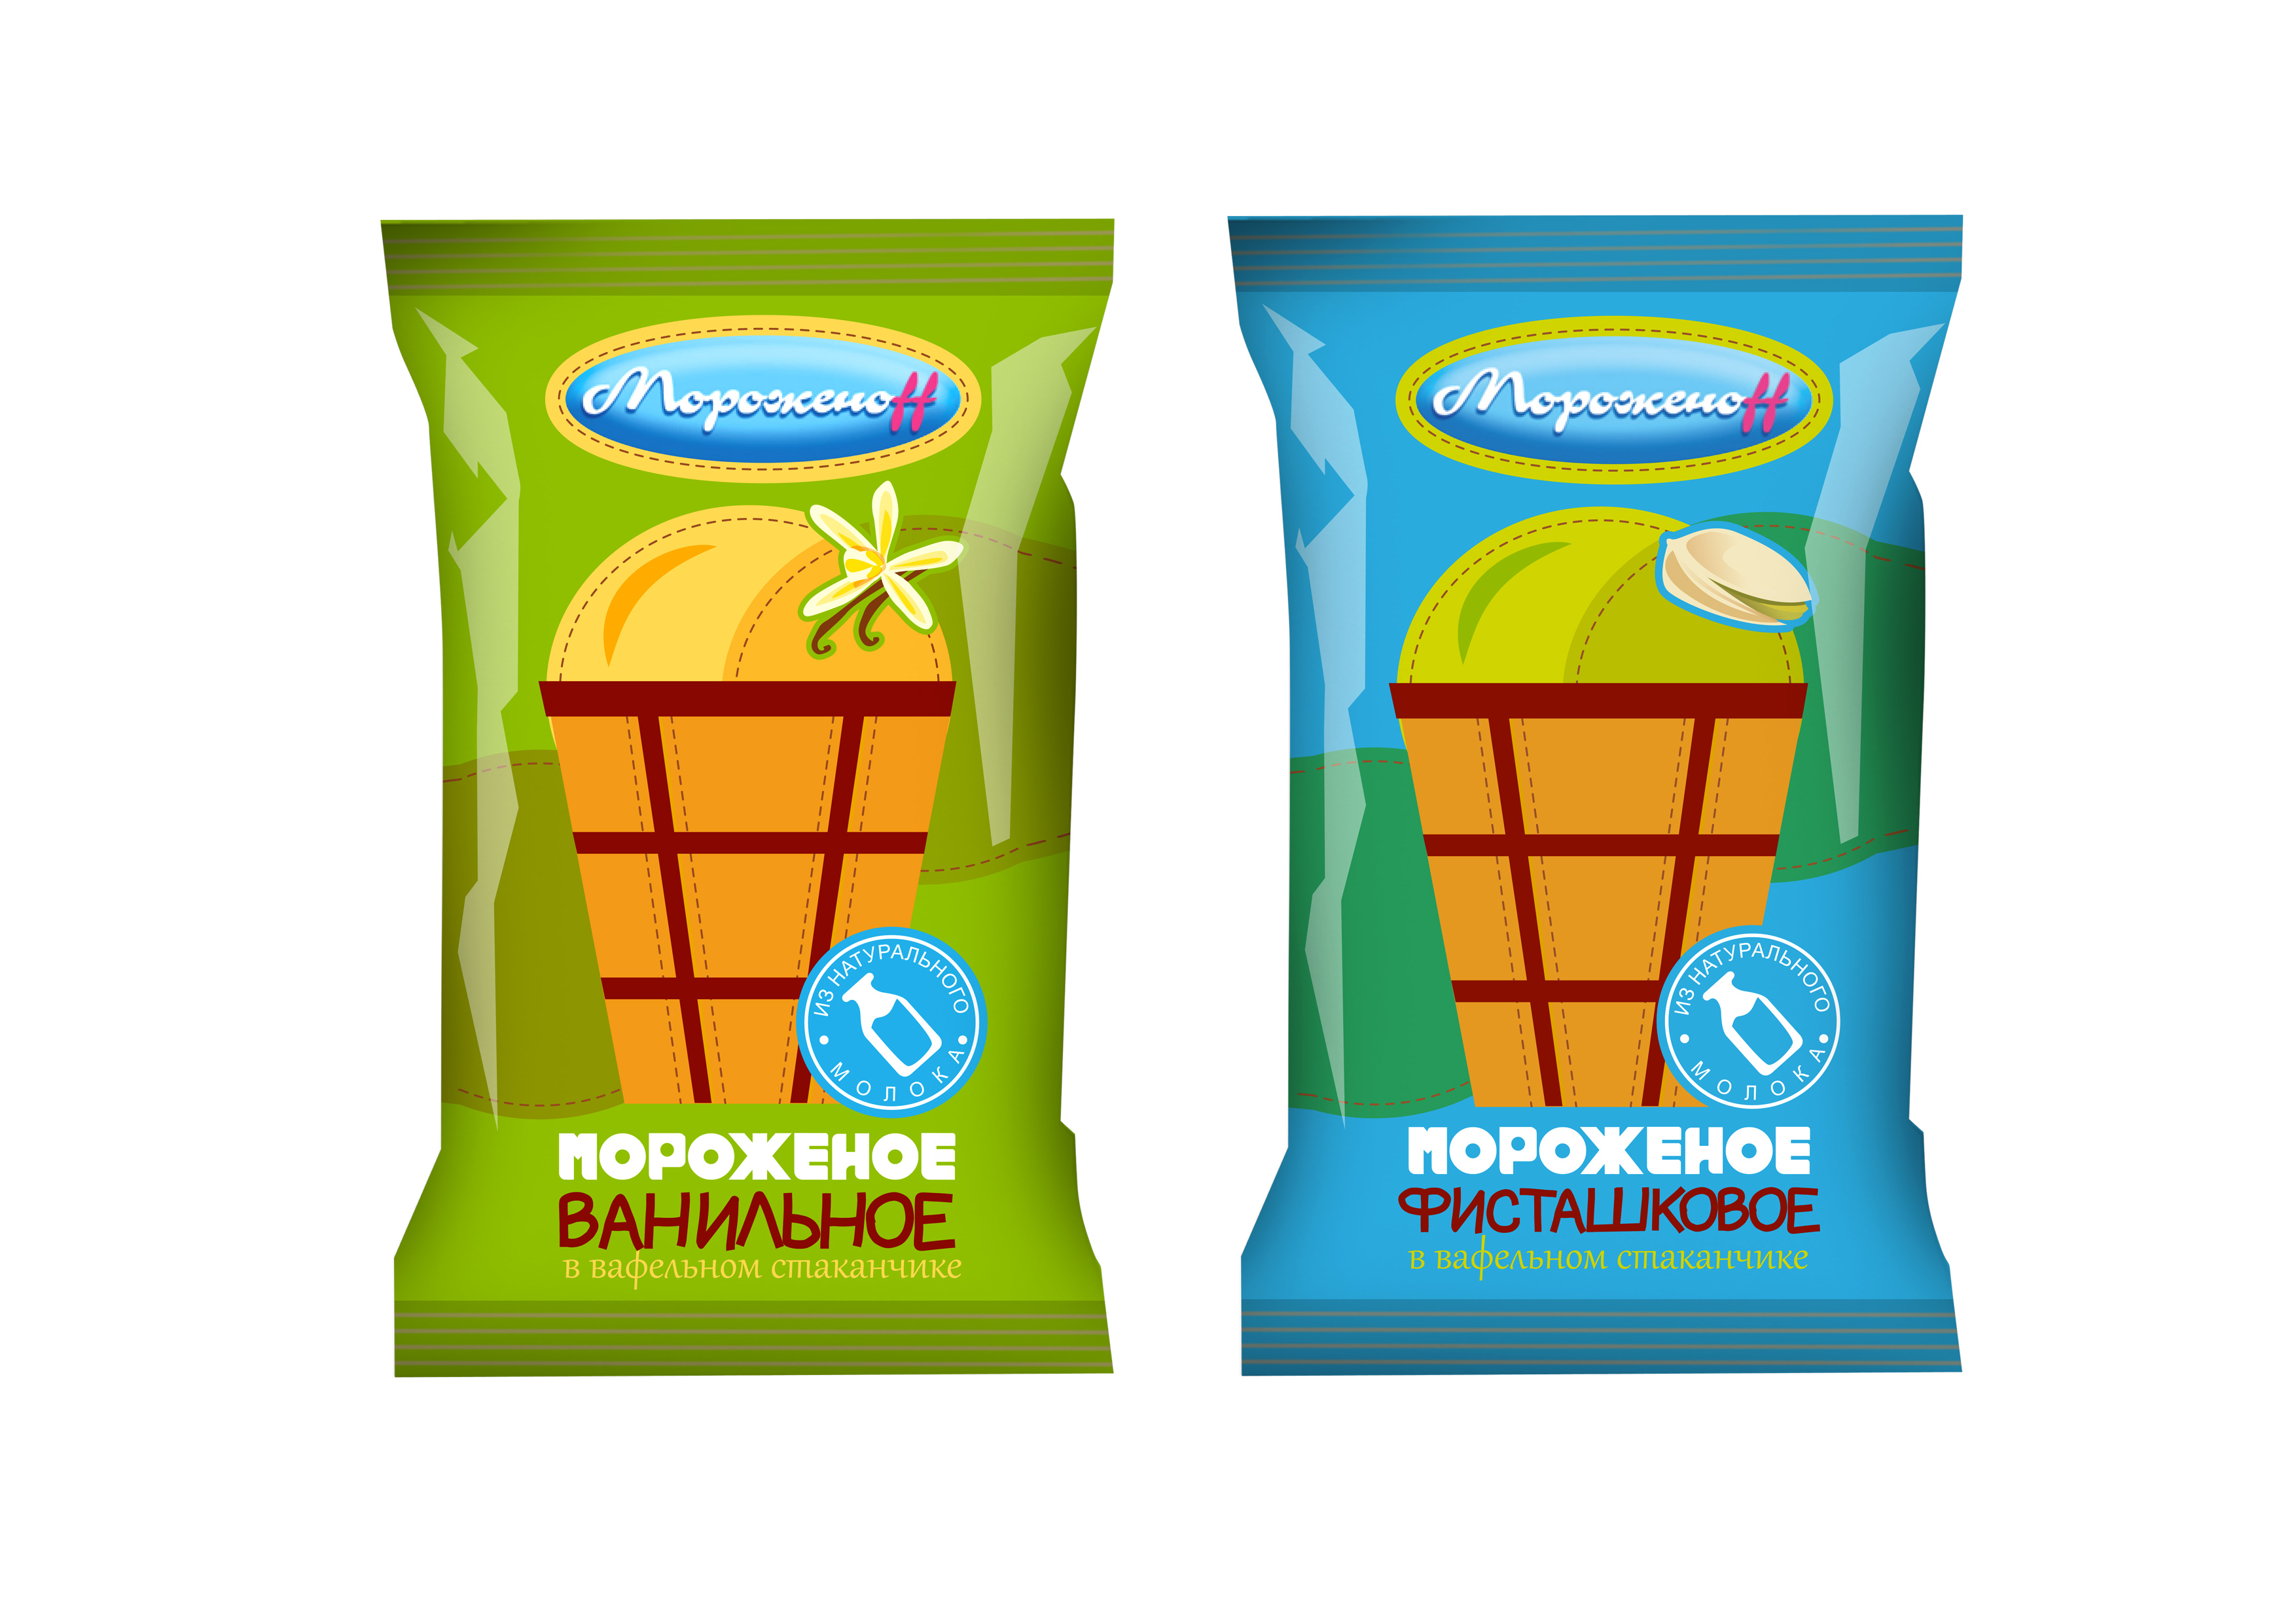 Разработка дизайна для упаковки мороженого фото f_456530f9cff83689.jpg